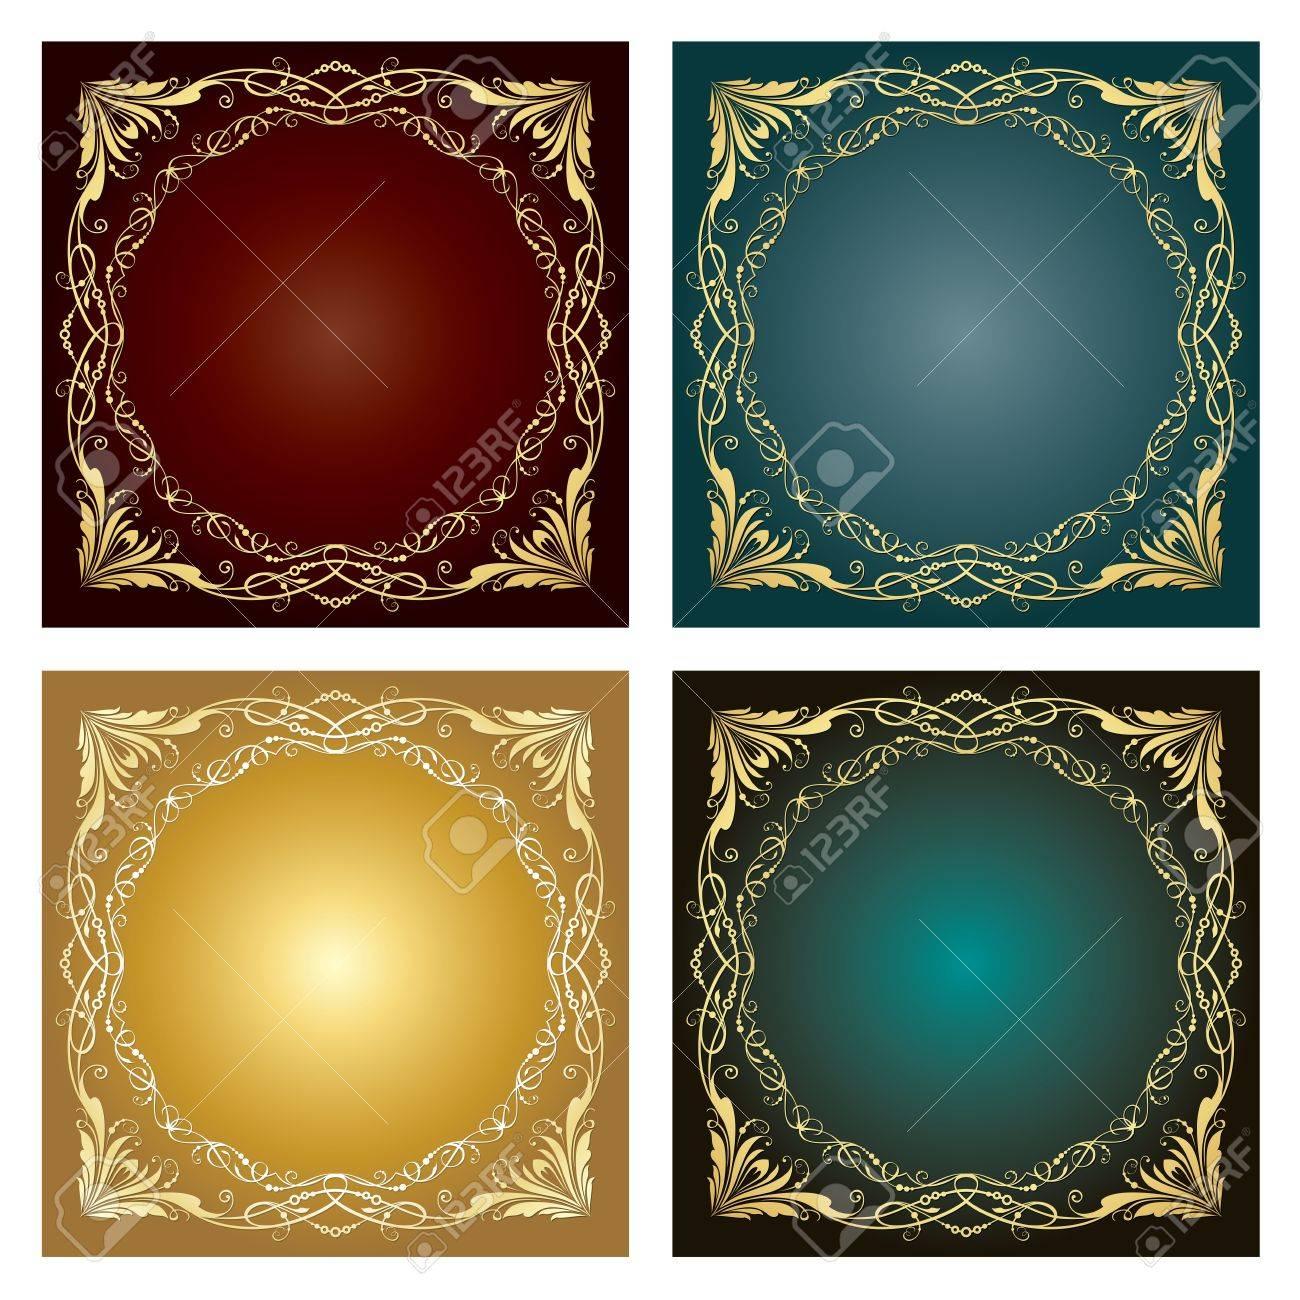 illustration Set of four vintage ornaments over colorized background.  illustration. Stock Vector - 14655700